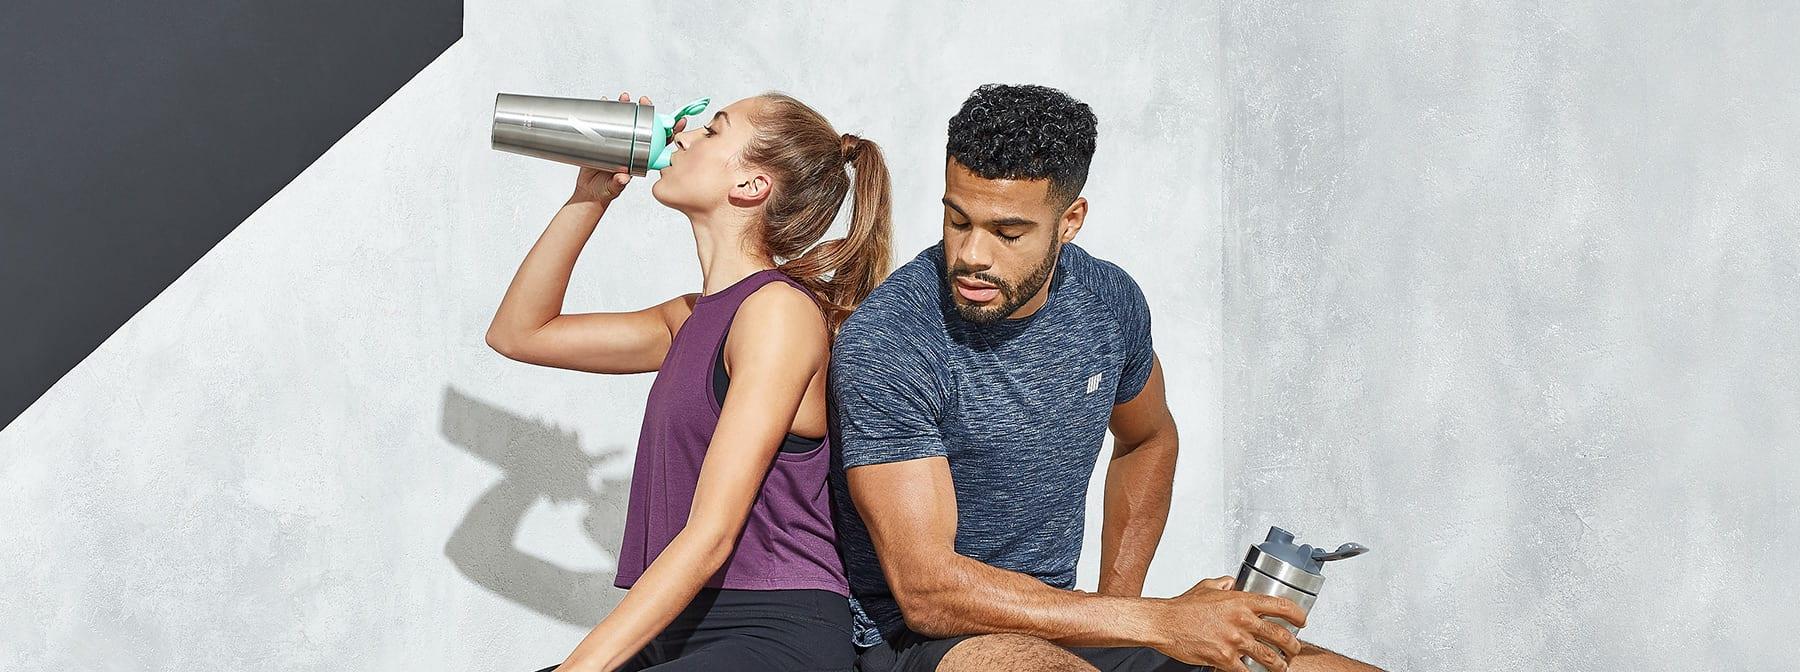 Kohlenhydrate nach dem Workout – Ja oder Nein?